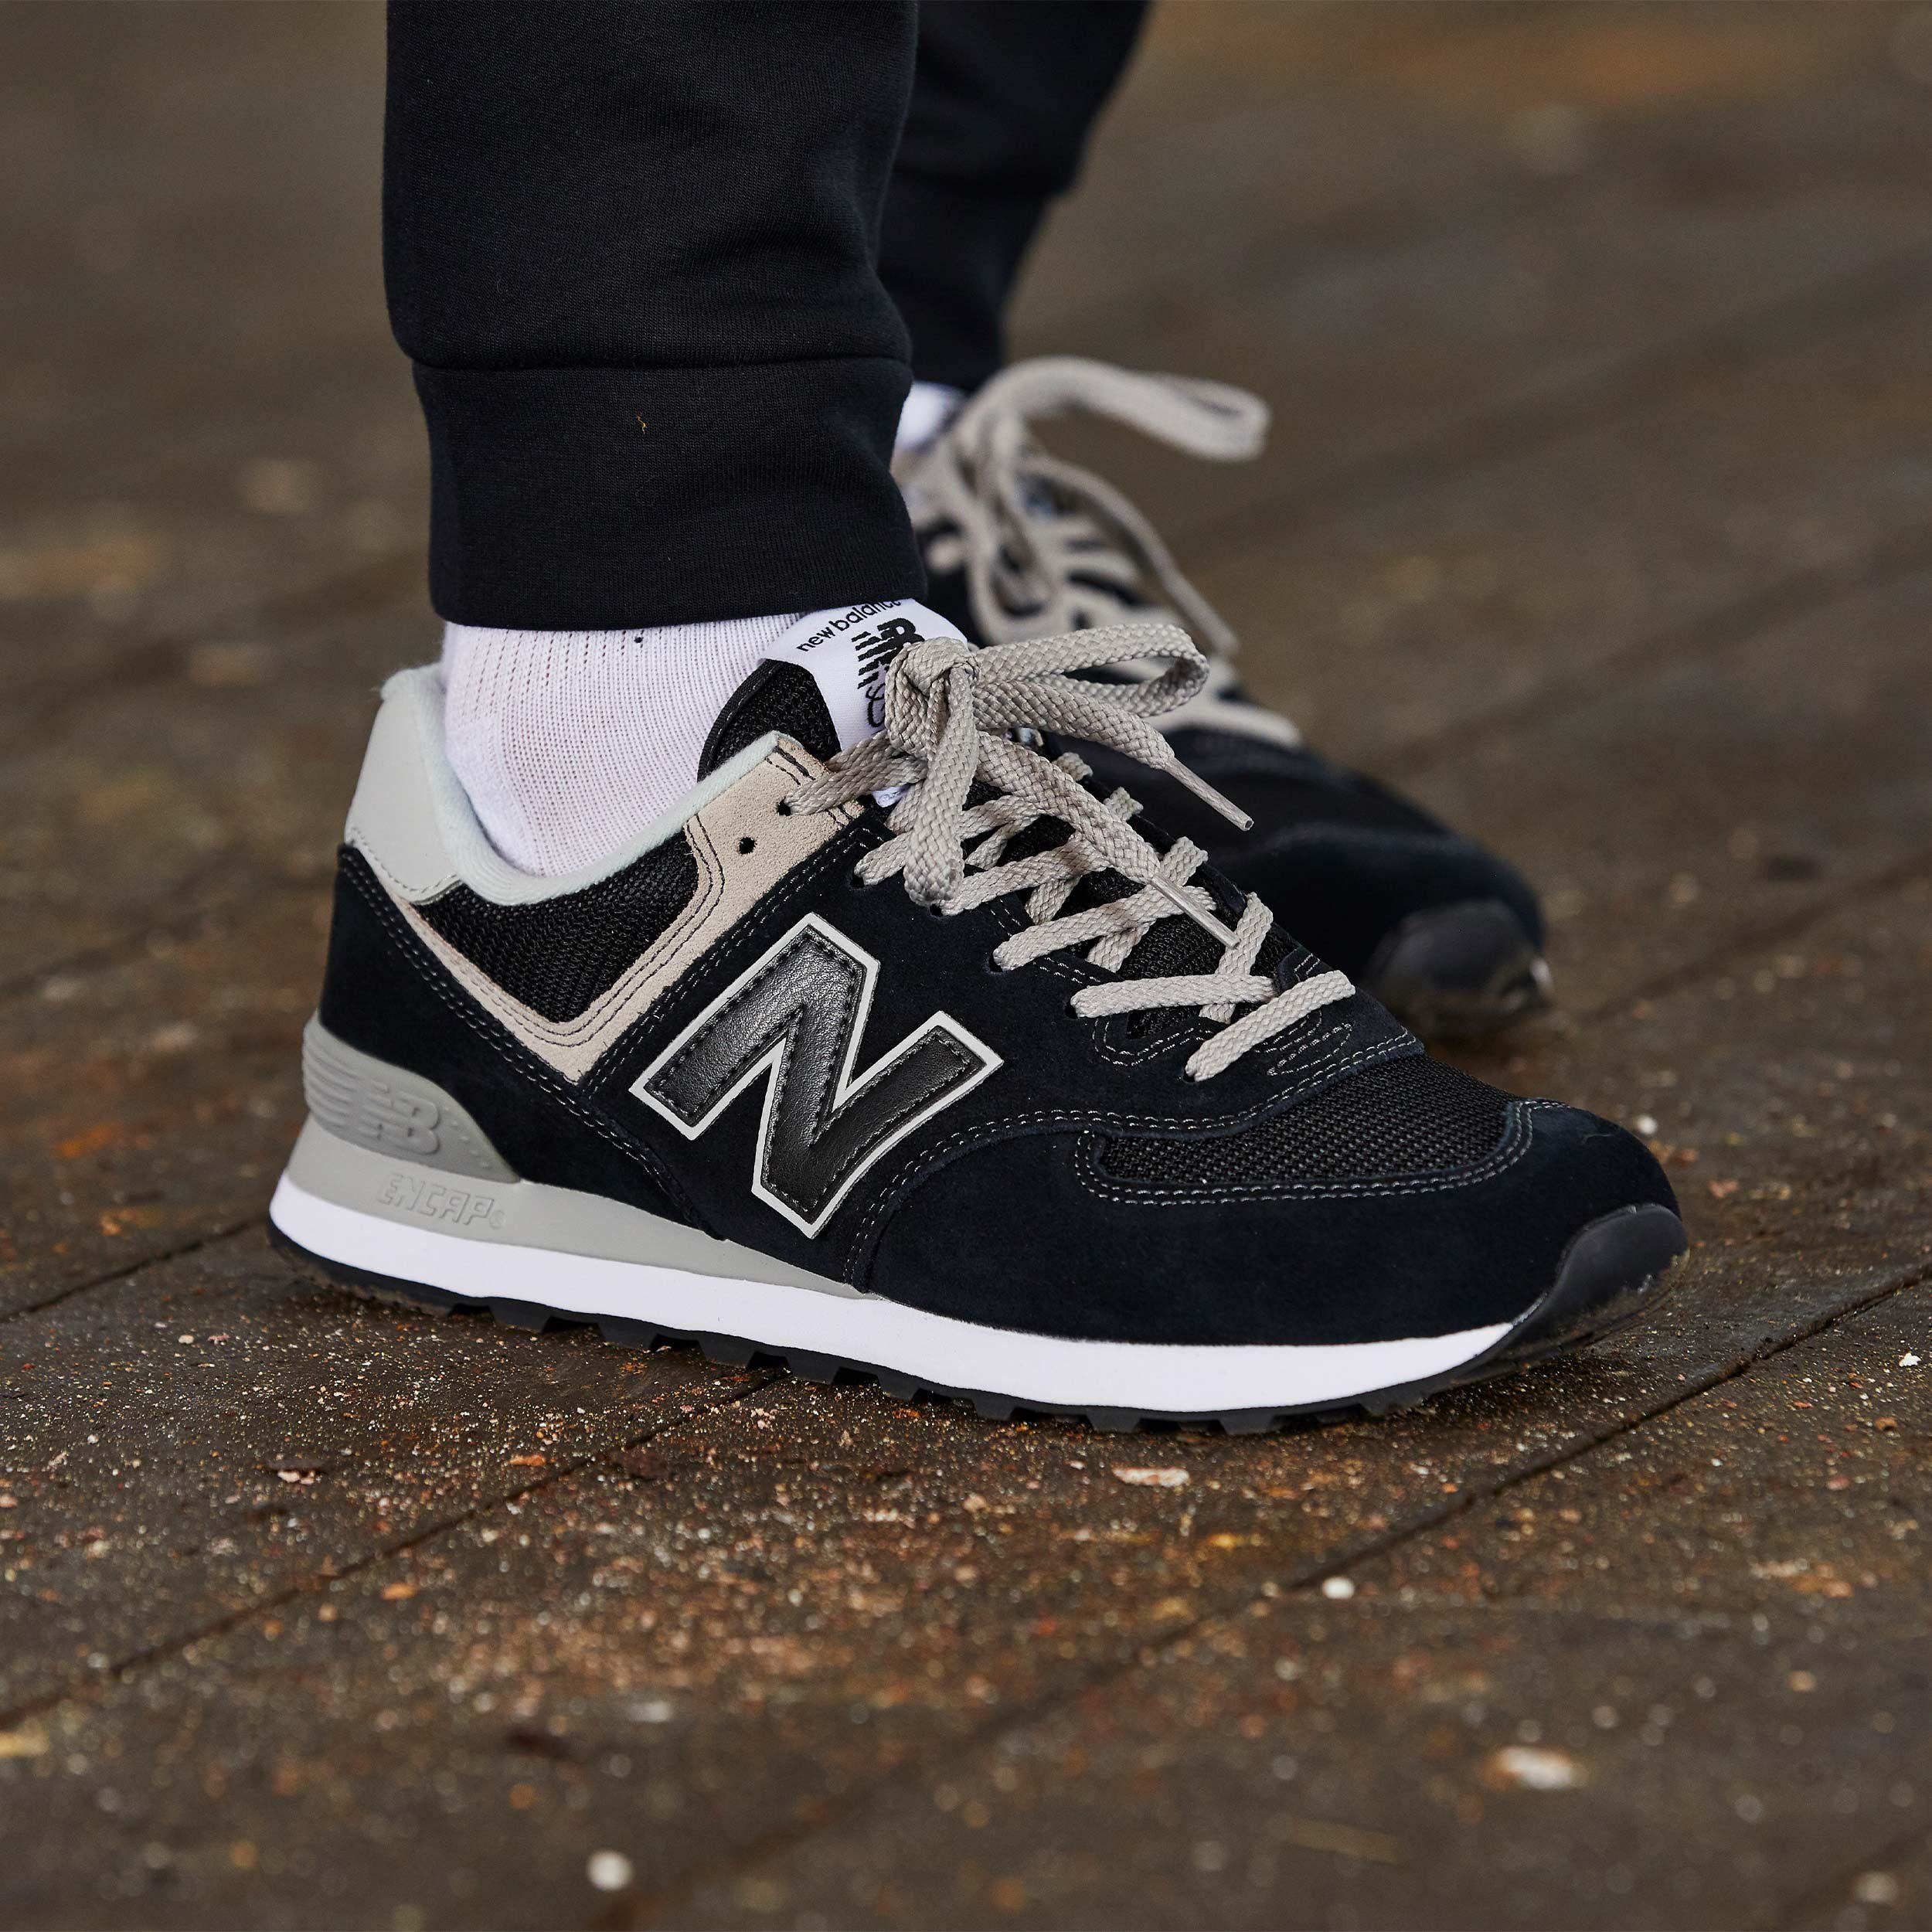 new balance 574 size 6